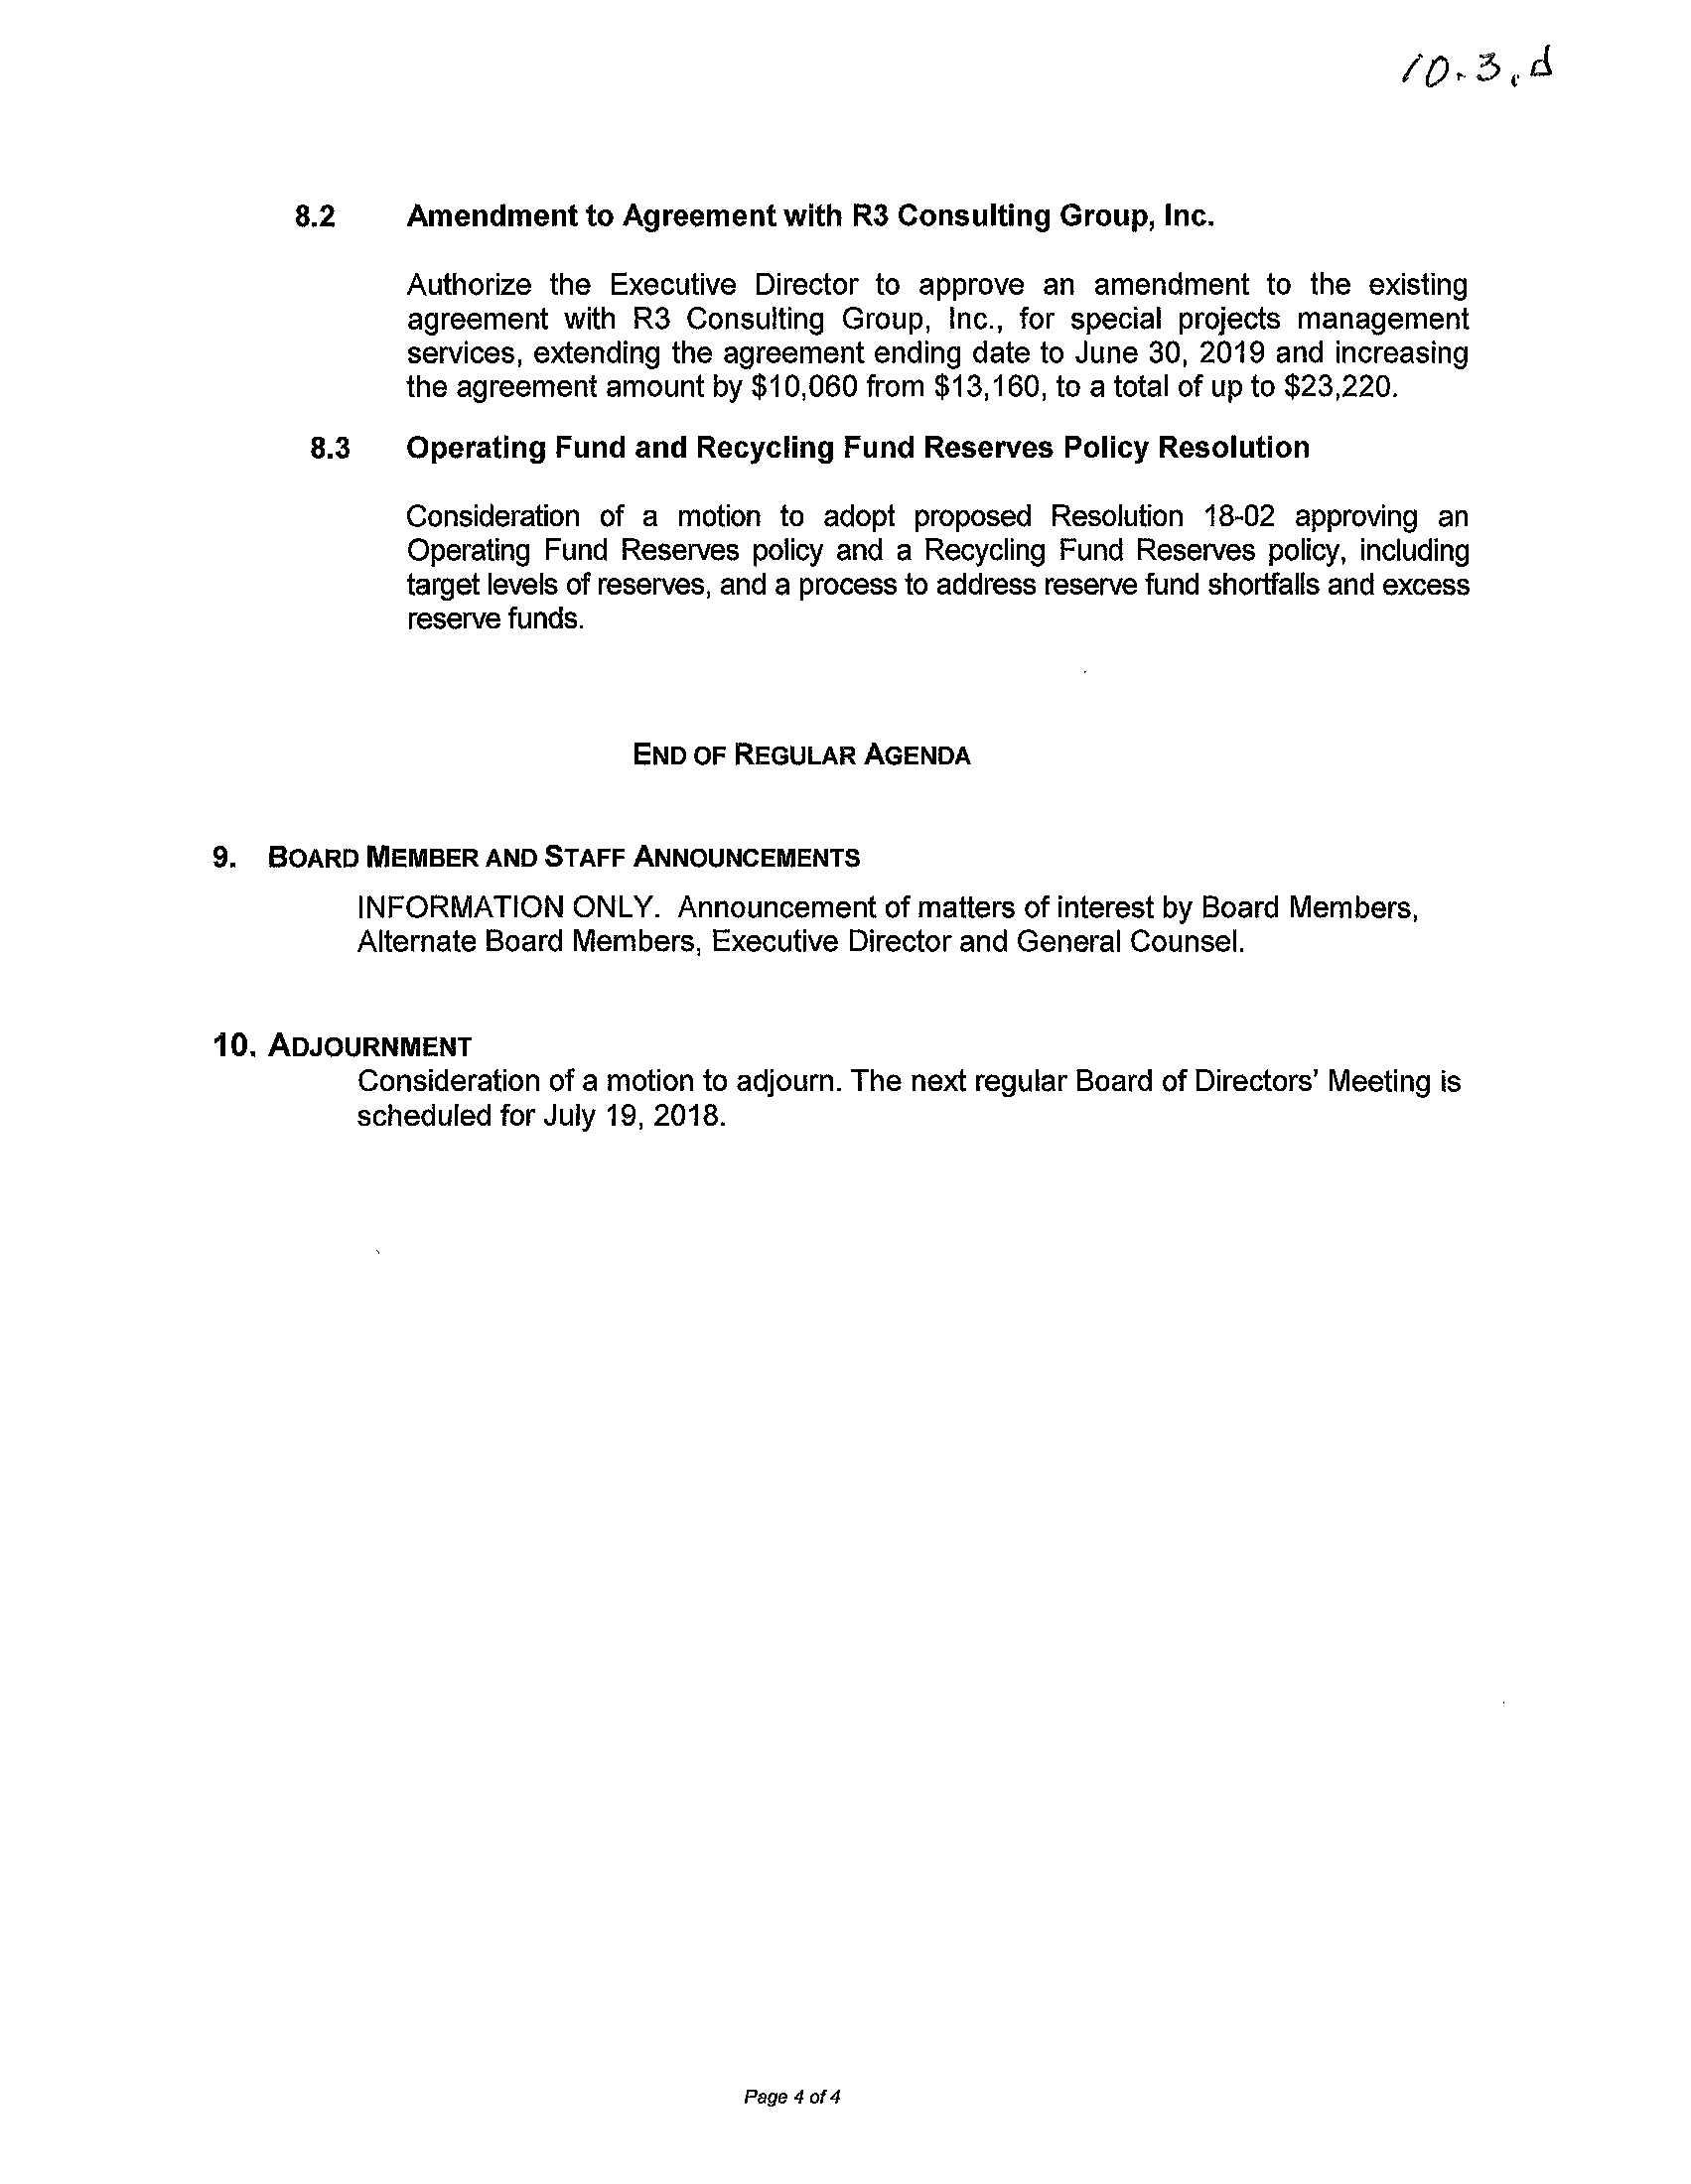 ESMAC Agenda 7.11.2018 (36 Pages)_21.jpg